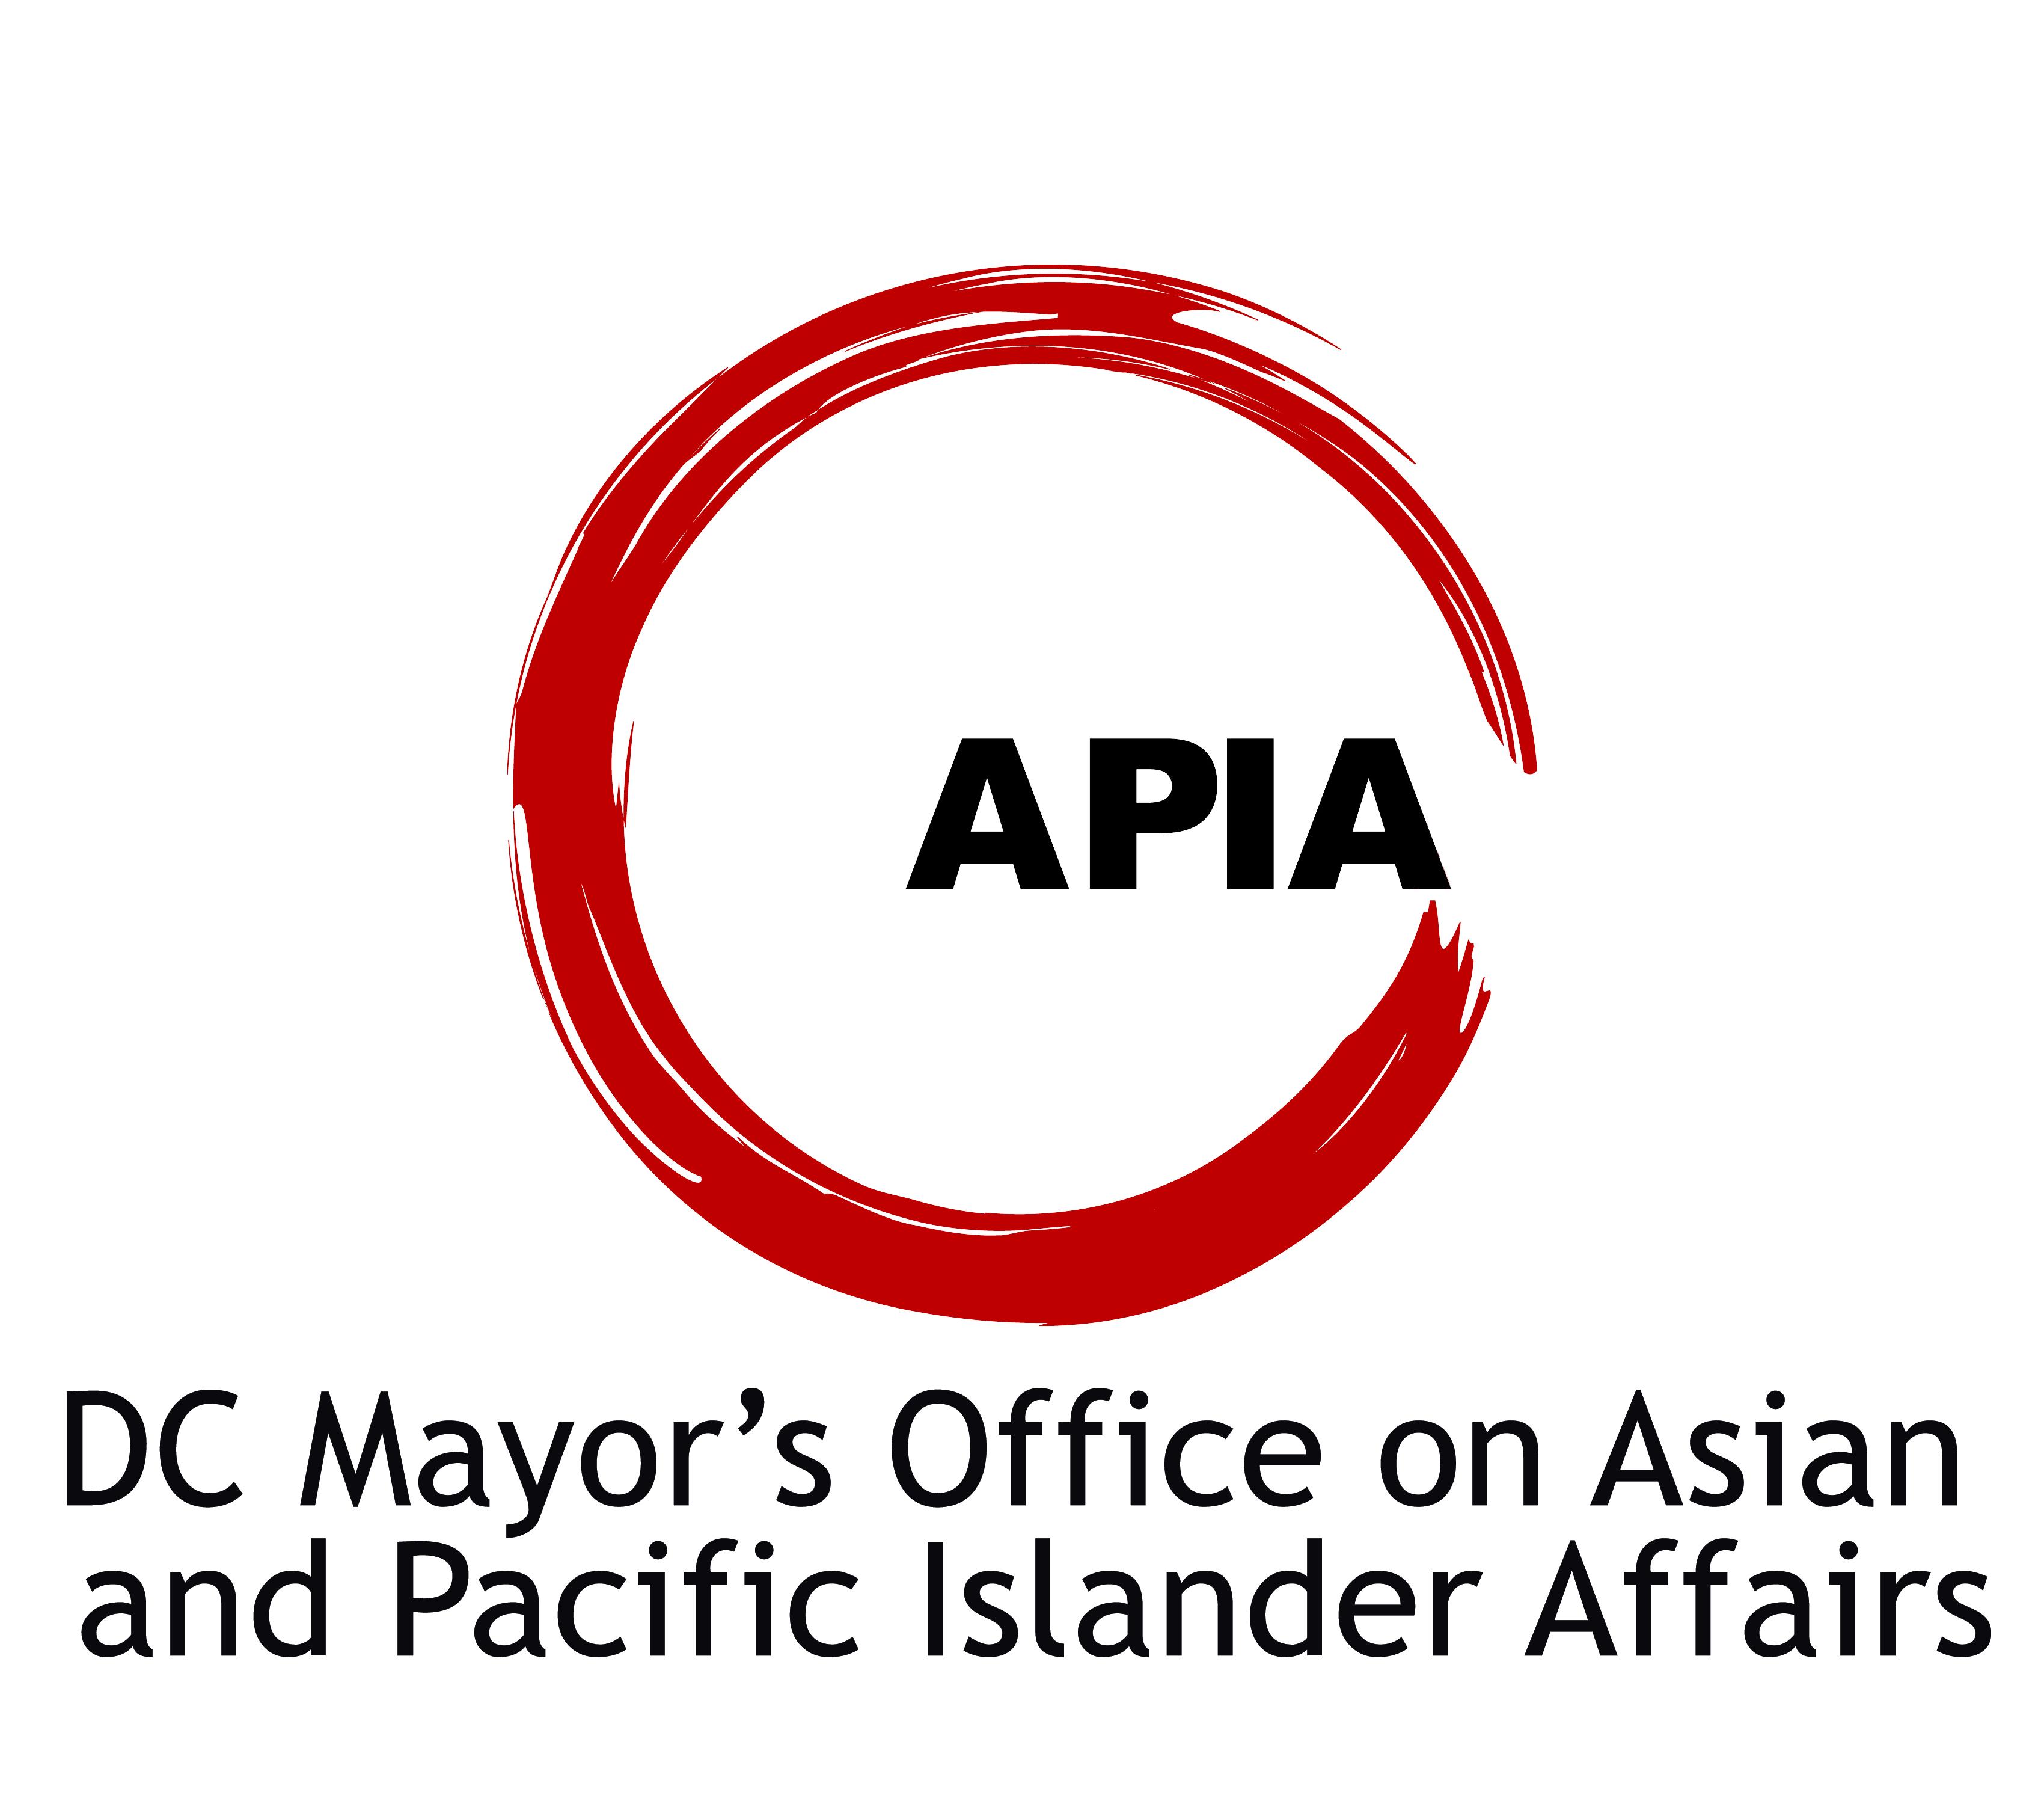 oapia logo